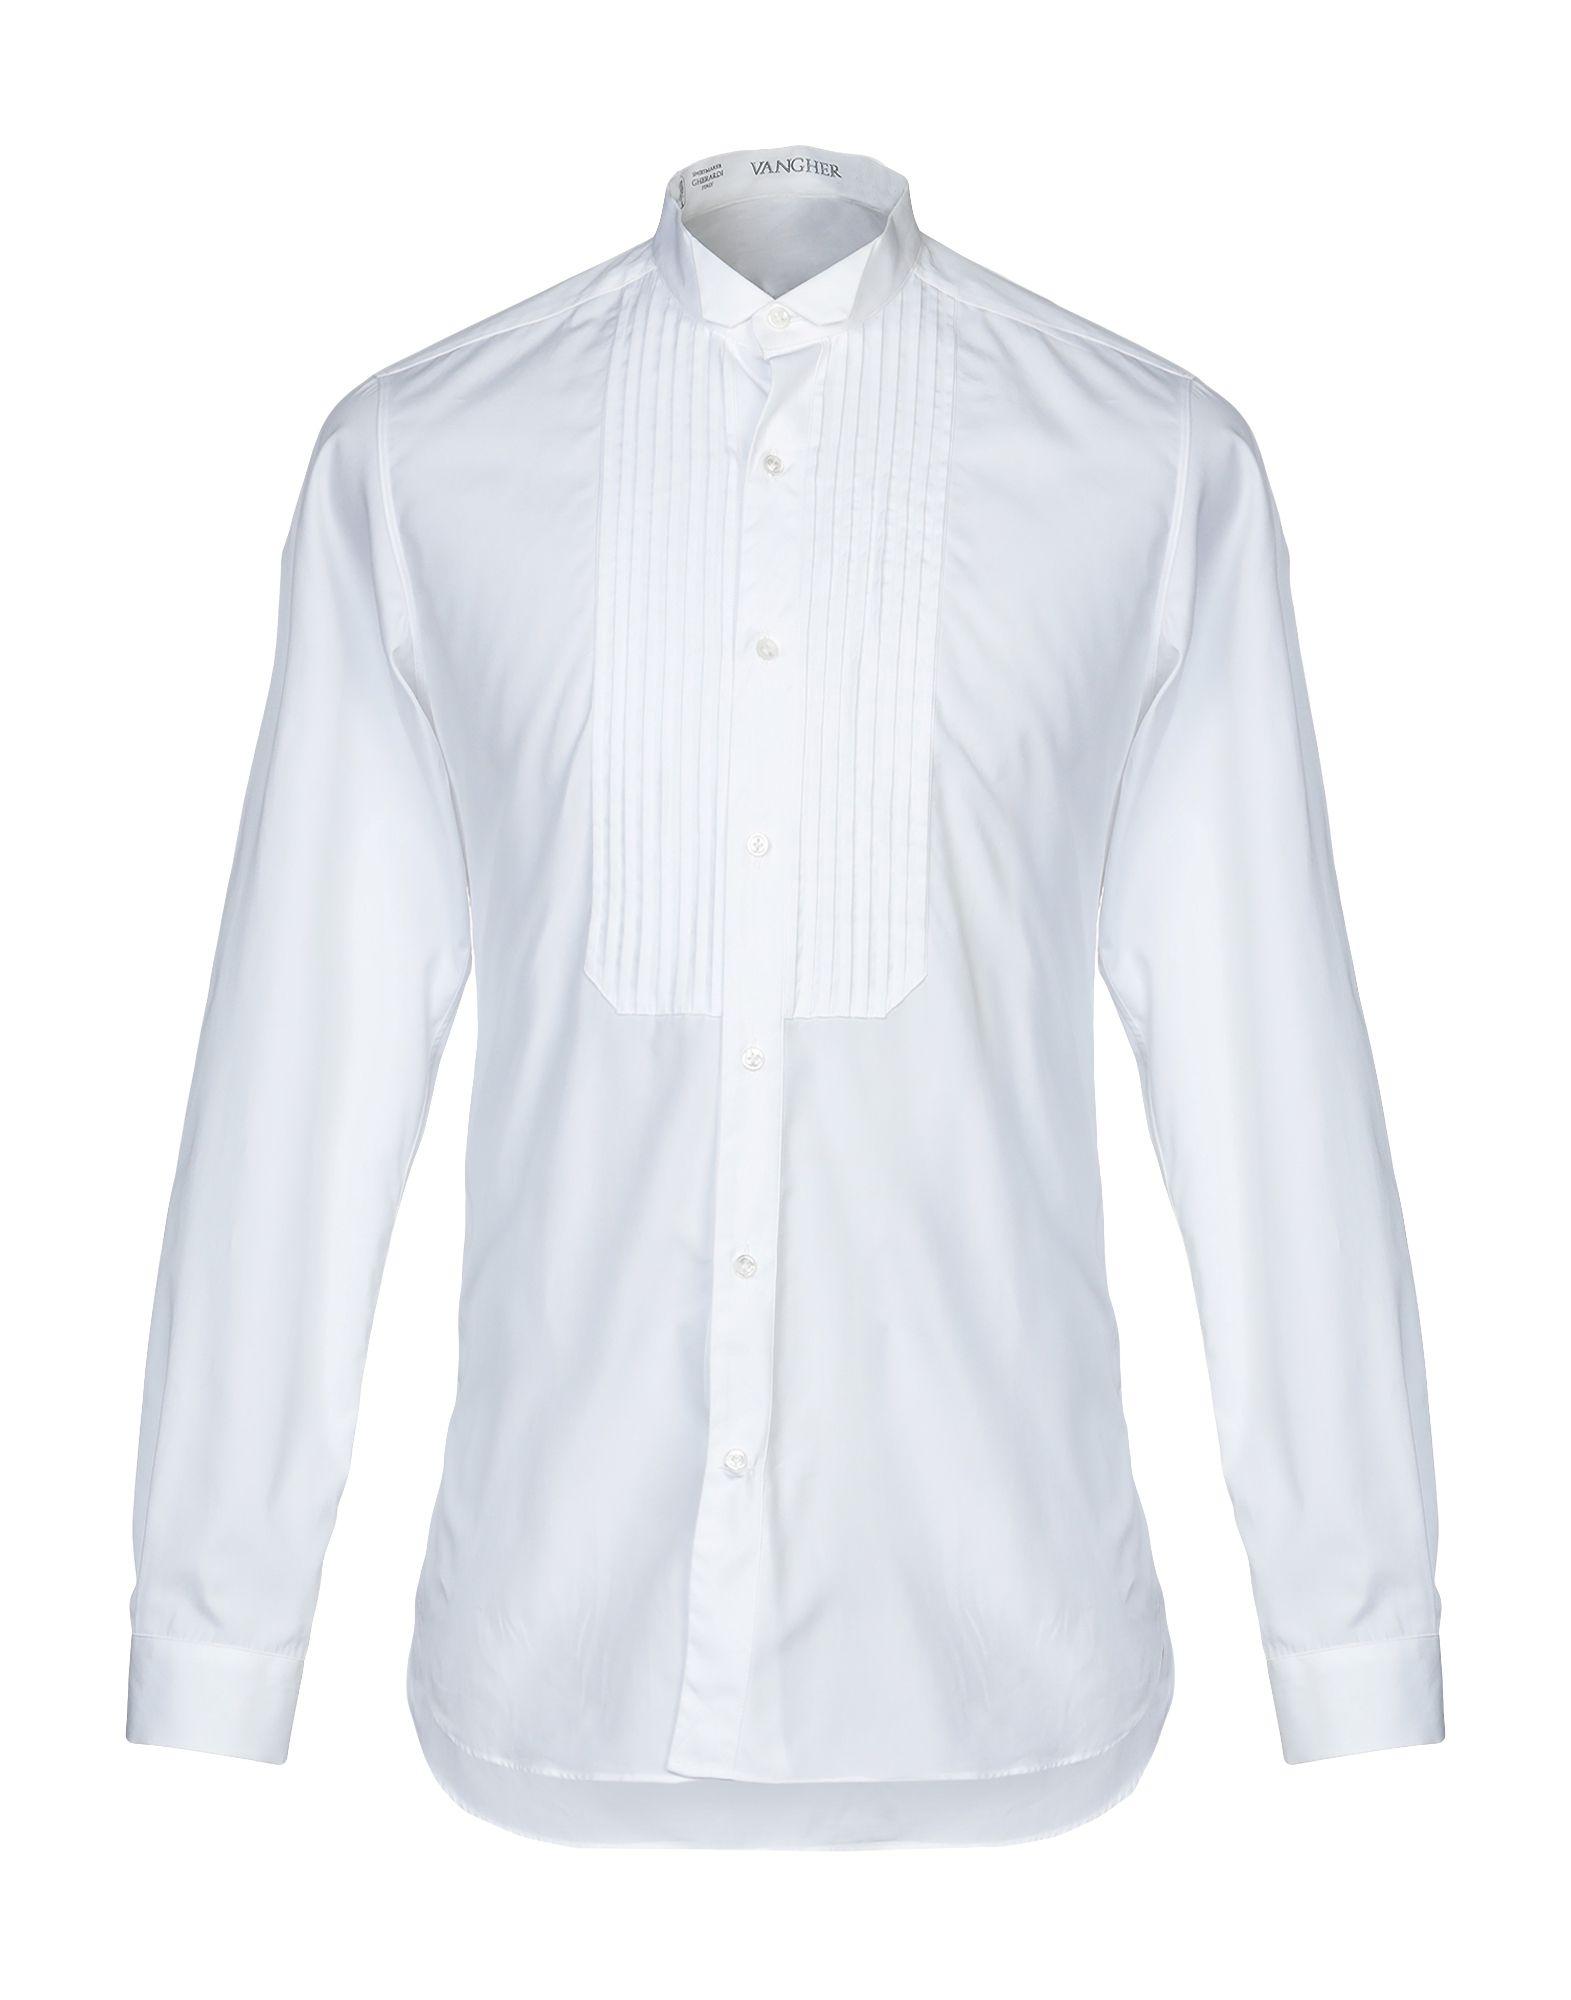 Camicia Tinta Unita Vangher N.7 herren - 38637920UF